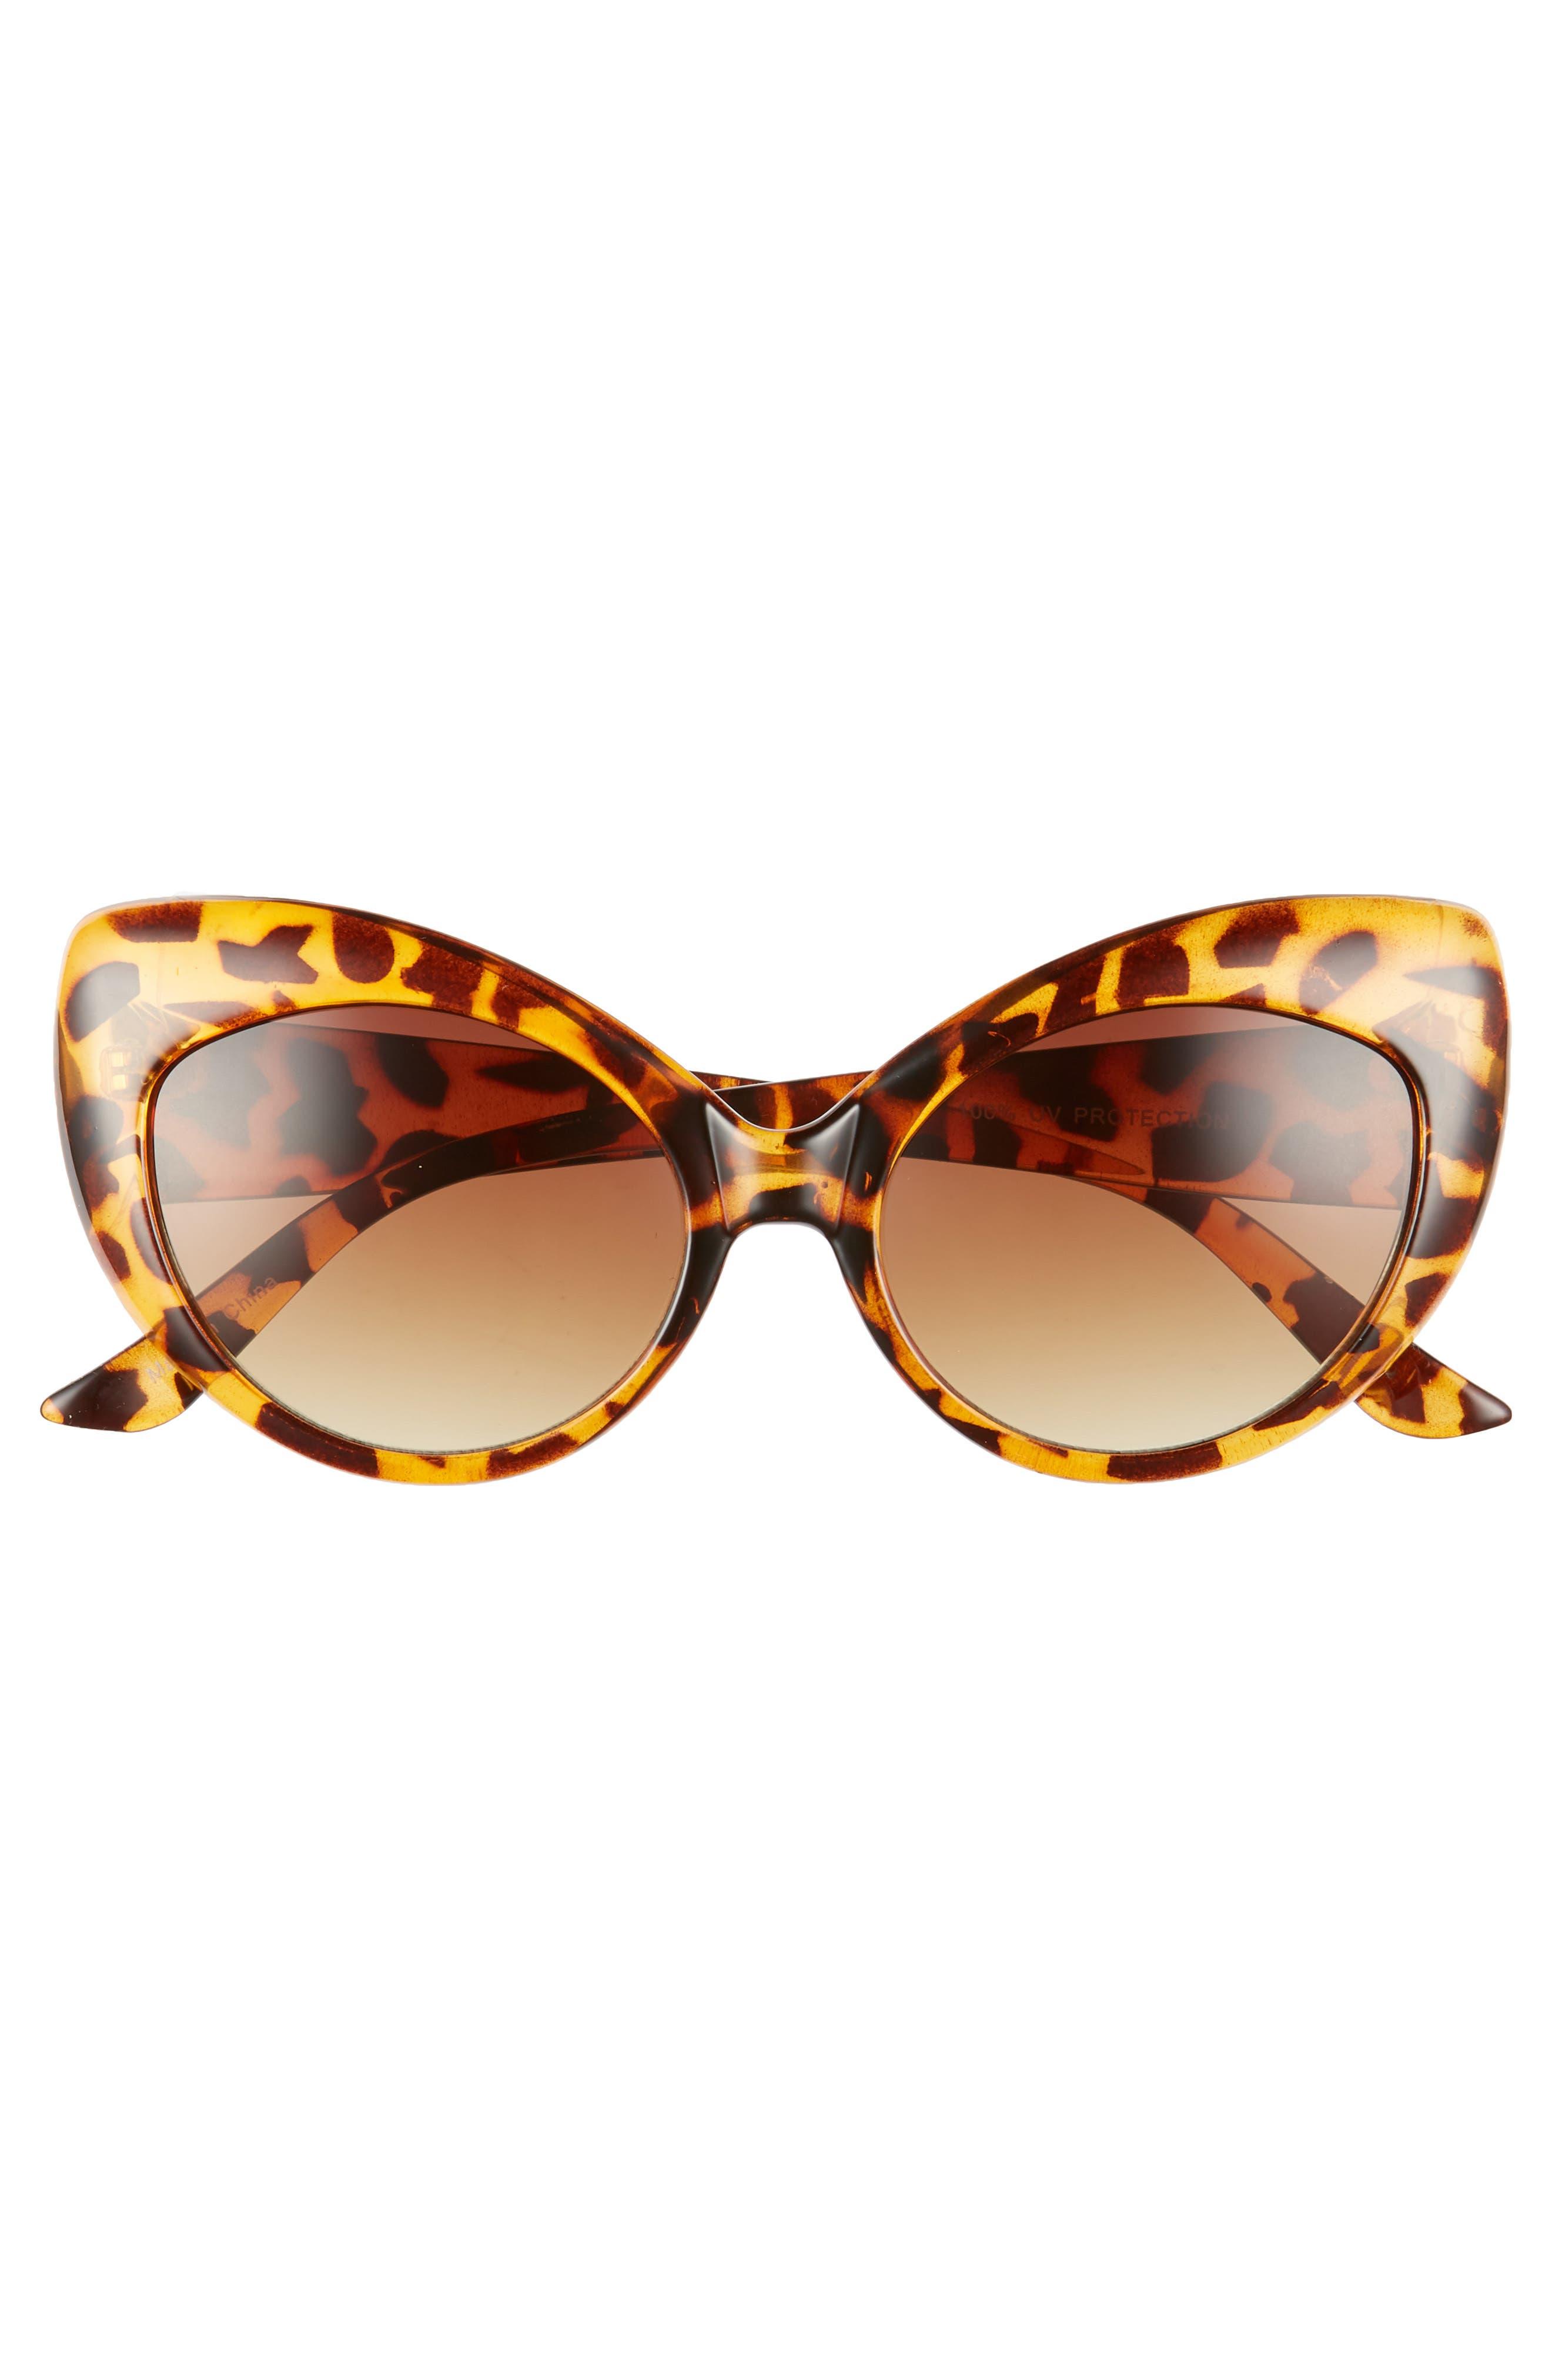 57mm Cheetah Pattern Cat Eye Sunglasses,                             Alternate thumbnail 3, color,                             200